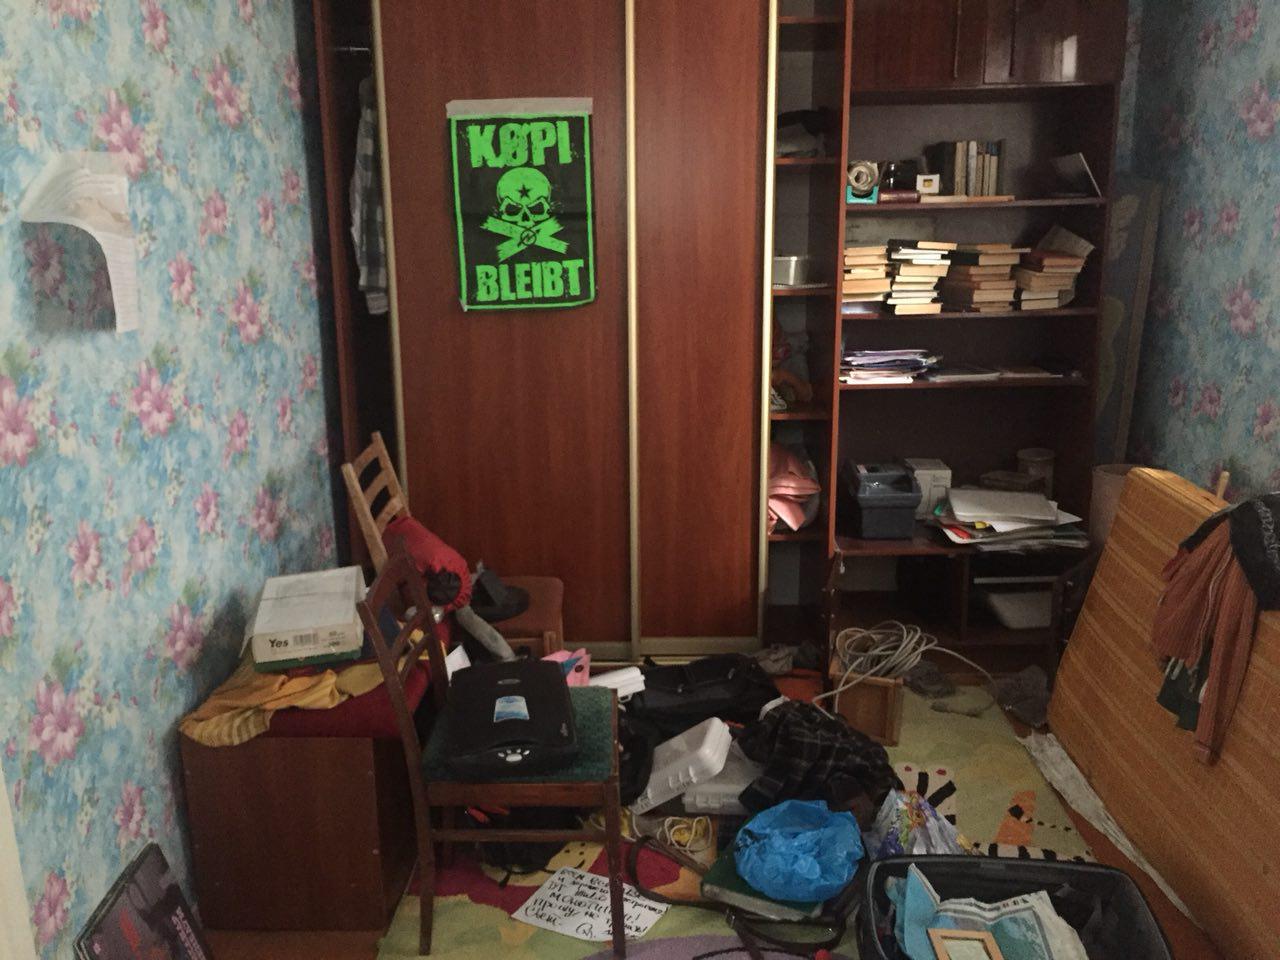 Квартира Шестаковича после обыска